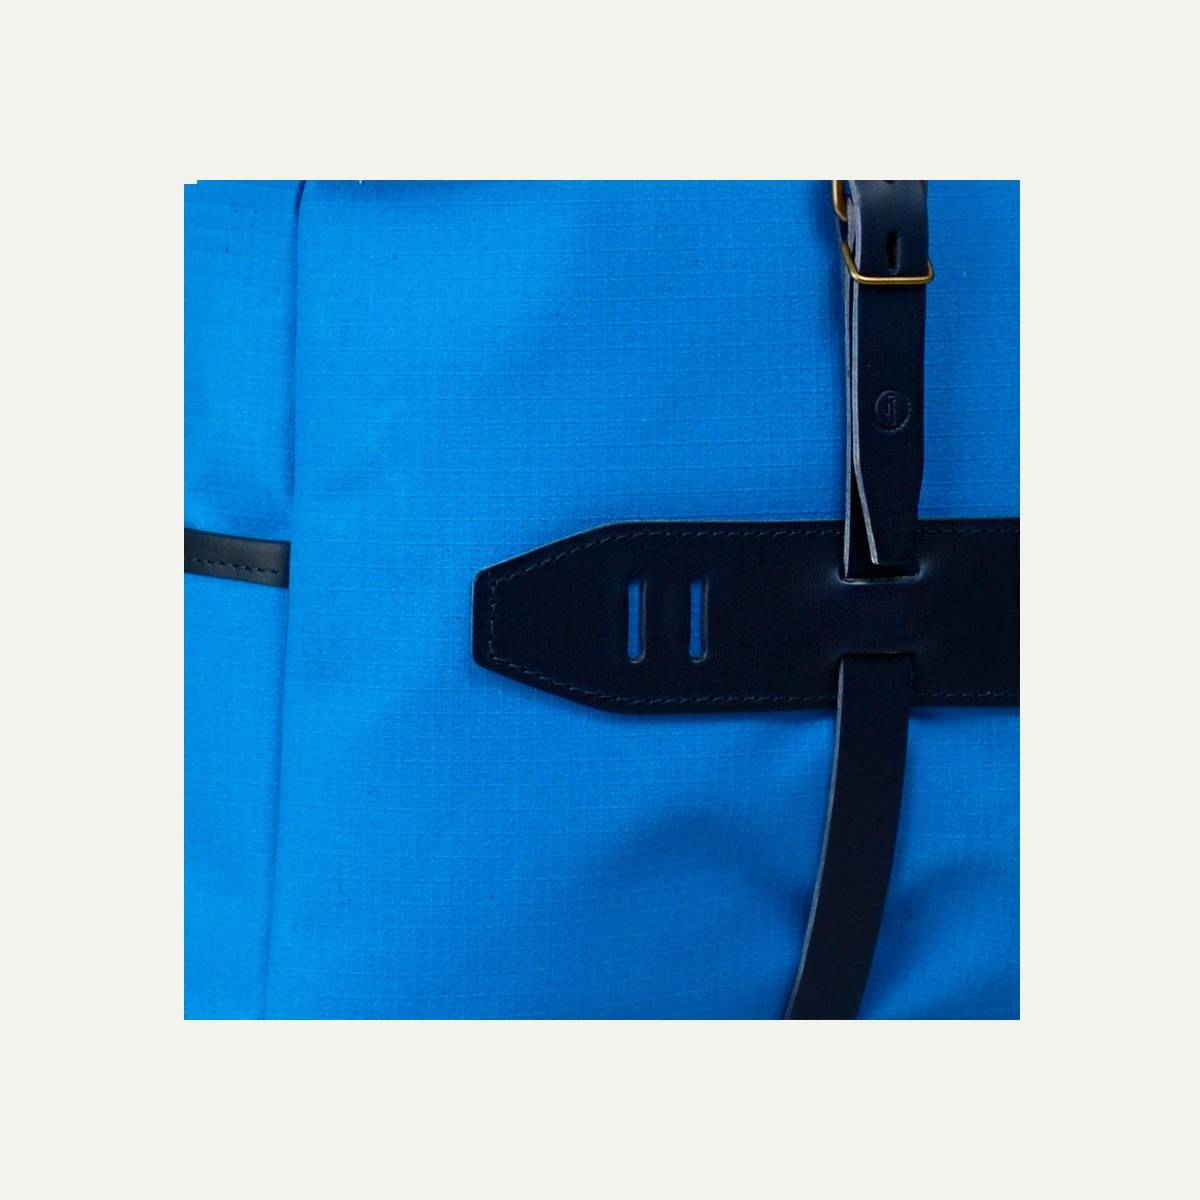 Jamy Backpack - Regentex Blue (image n°4)